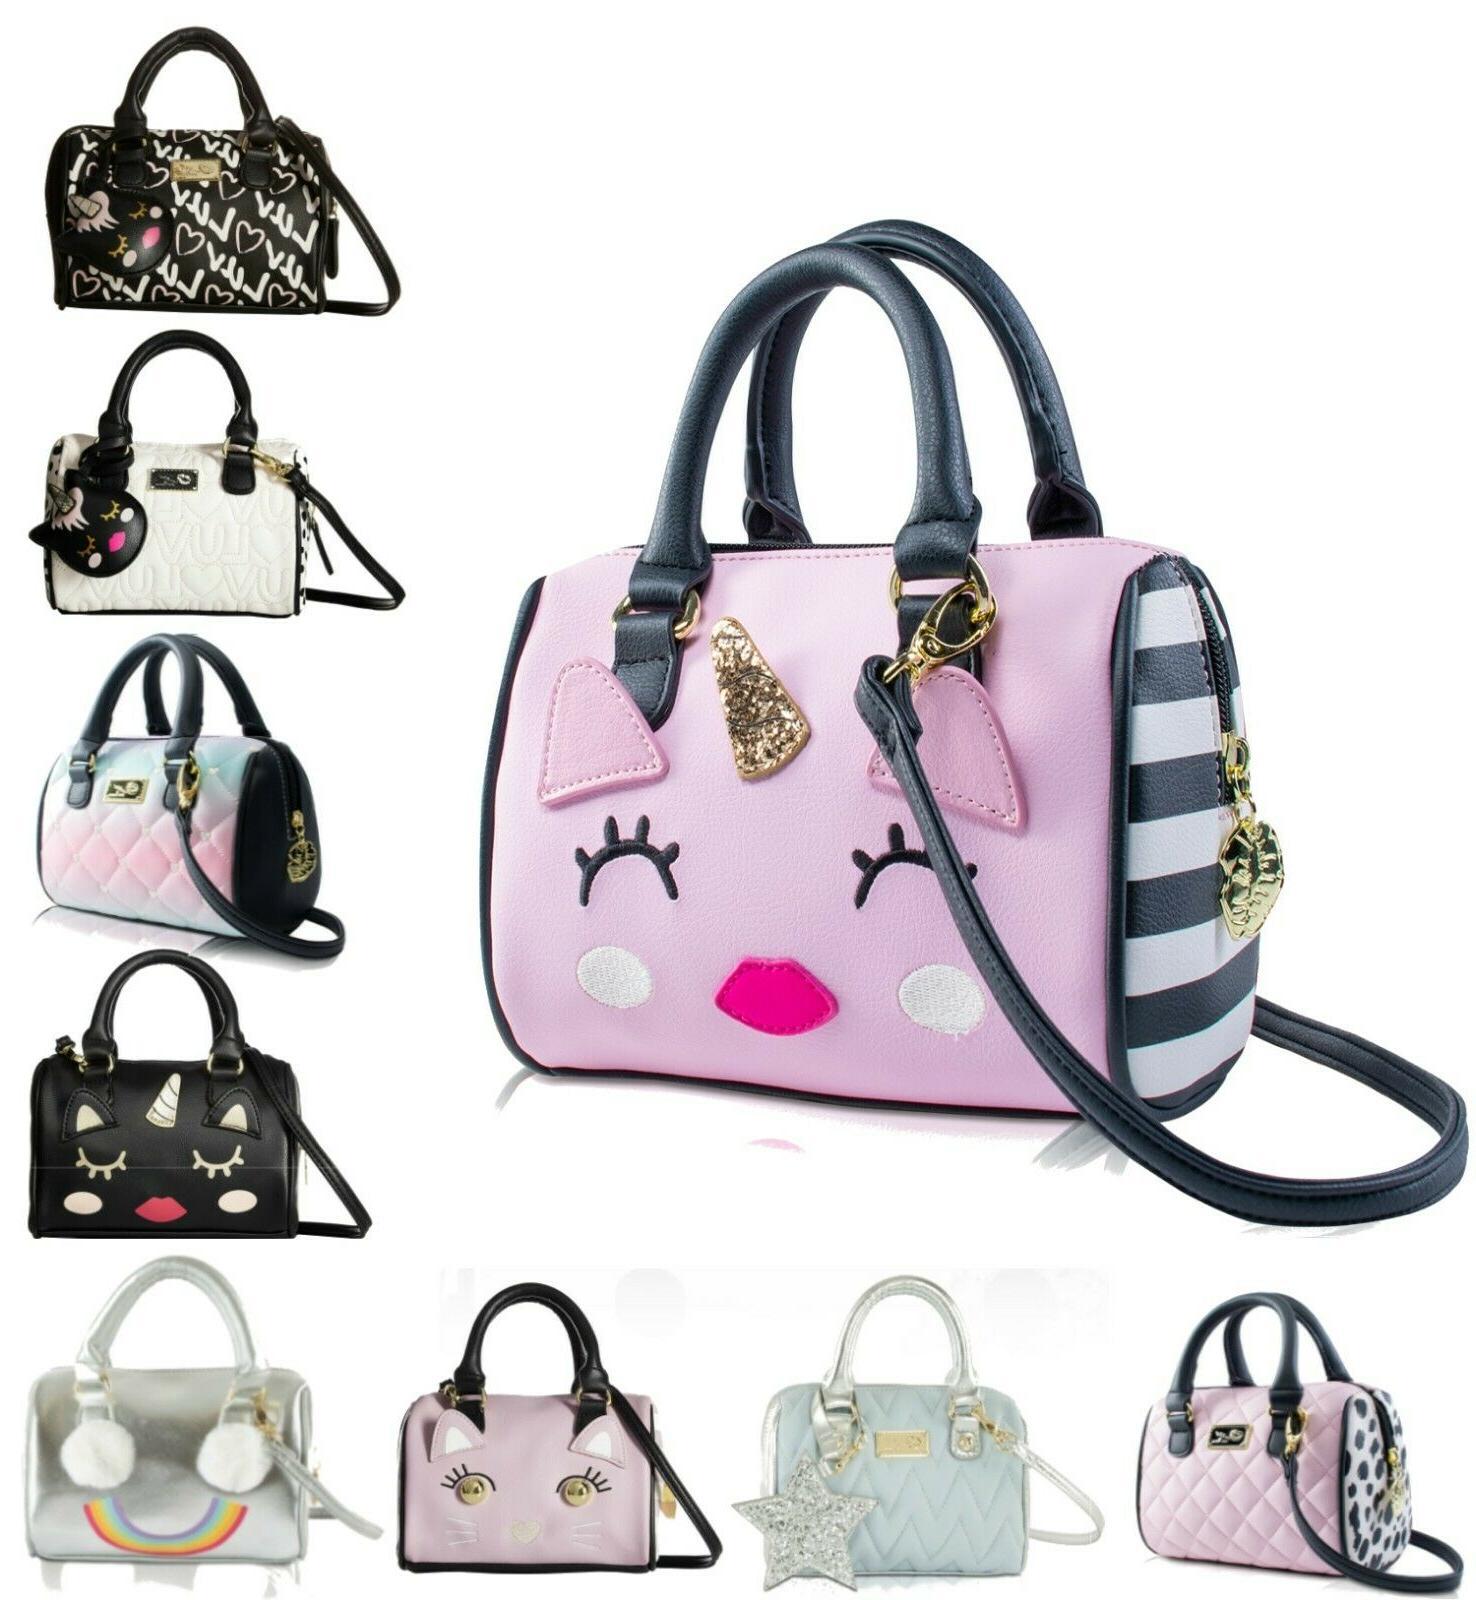 luv mini barrel purse crossbody satchel messenger